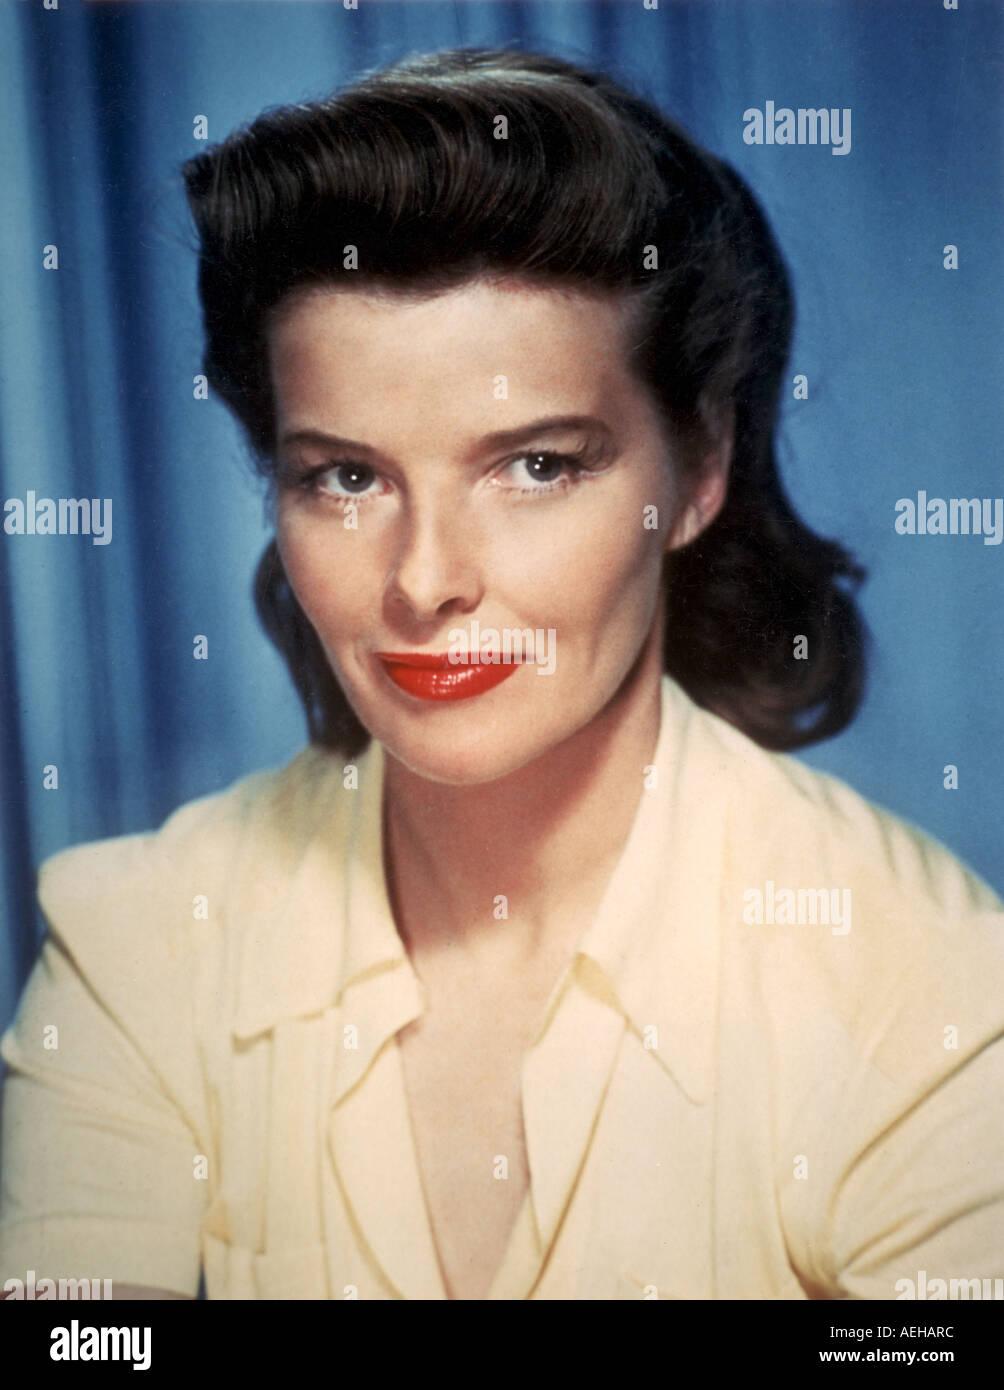 KATHARINE HEPBURN (1907-2003) Actrice américaine dans les années 1950 Photo Stock